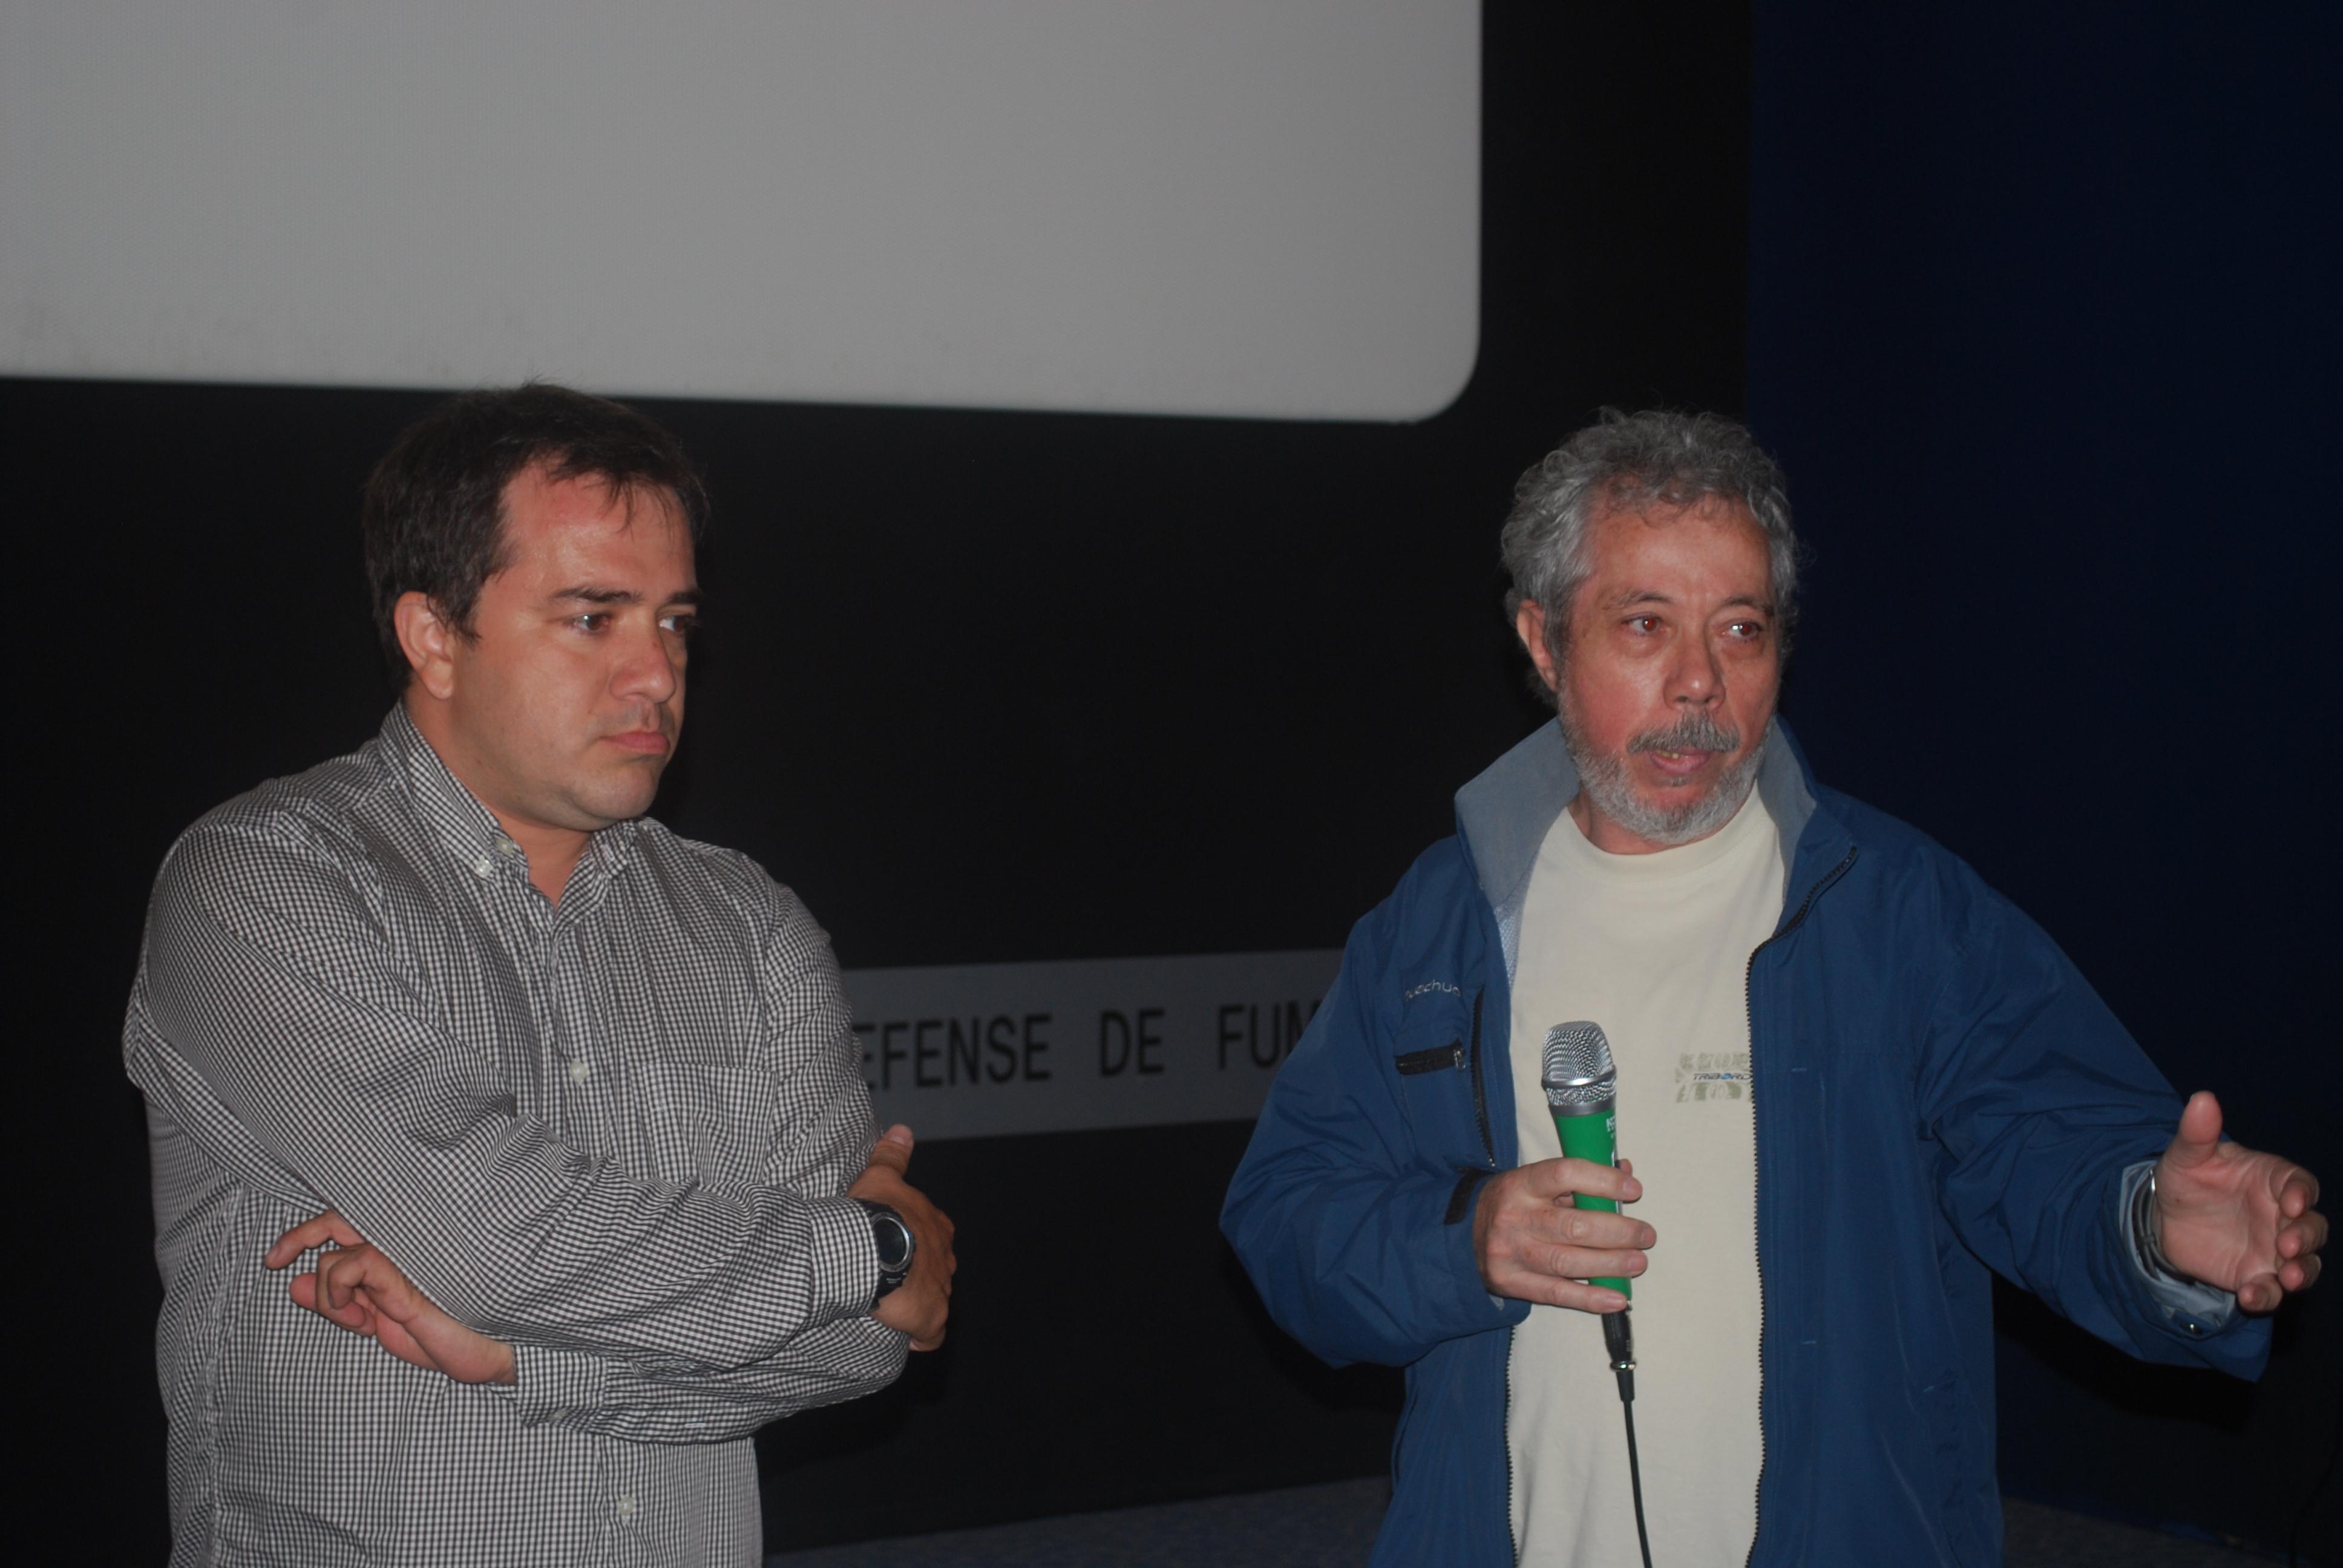 Juan Lozano et Fernand Meunier